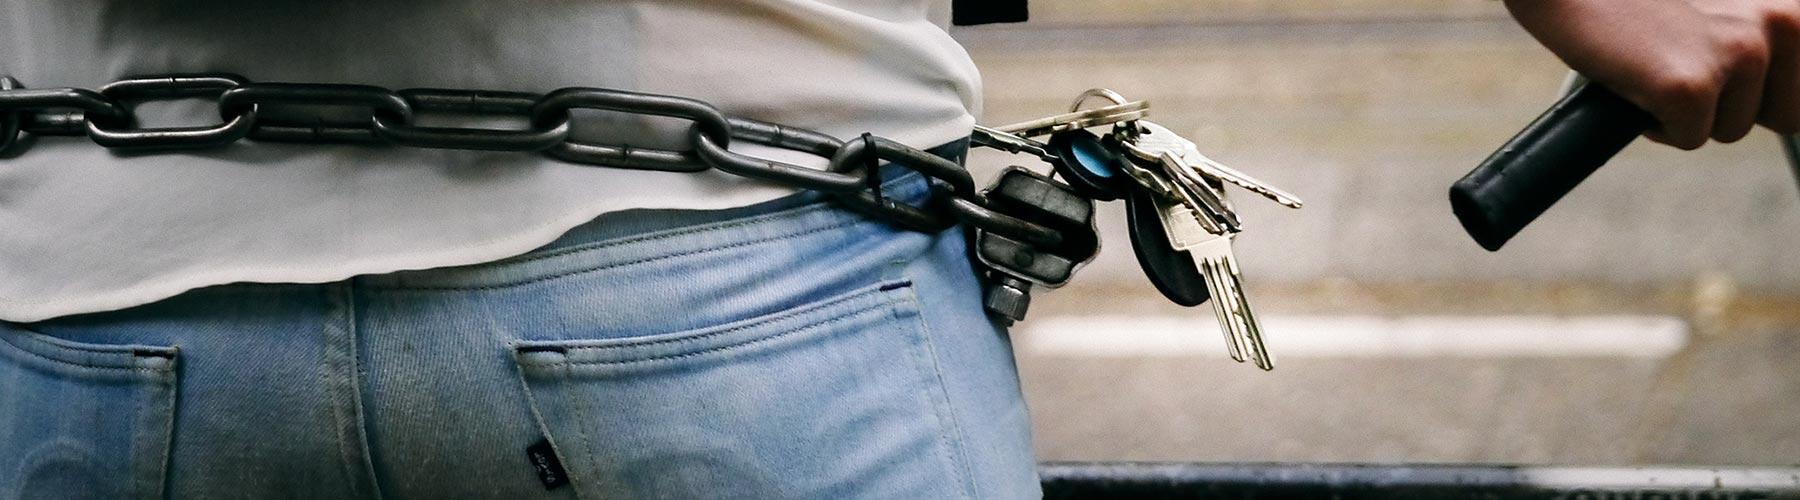 How to wear a bike lock